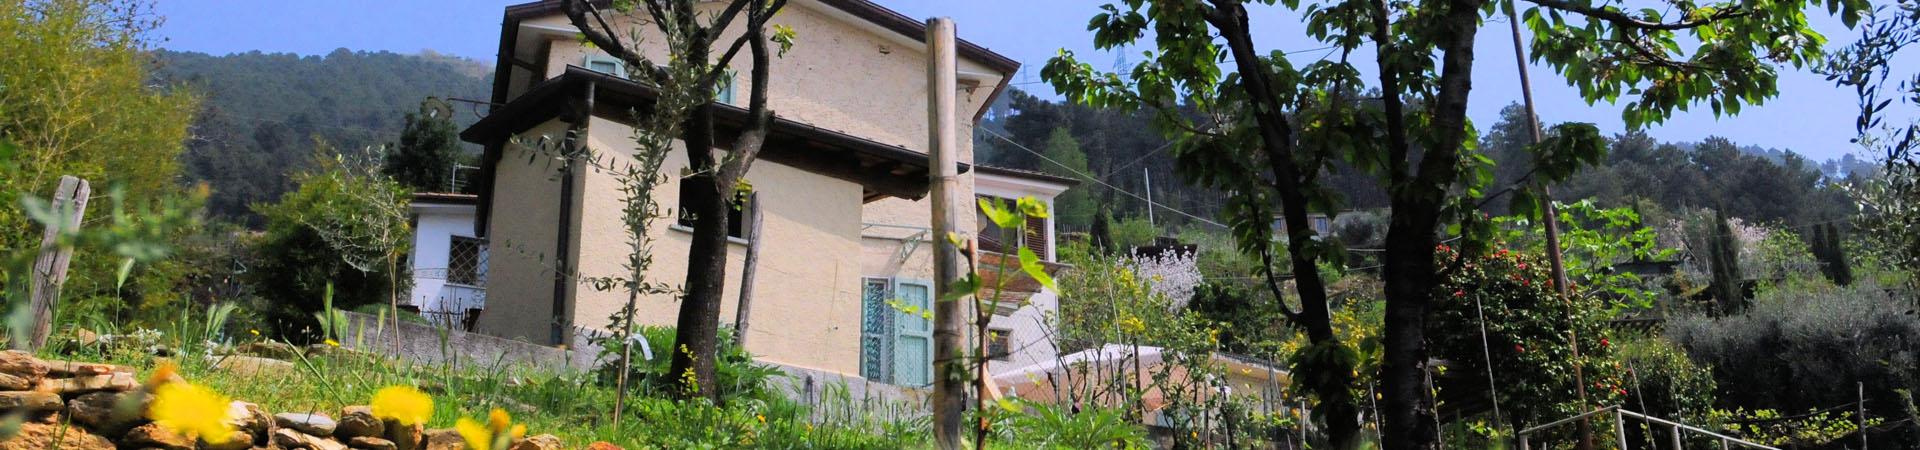 Toscana Forum, die Toskana Spezialisten